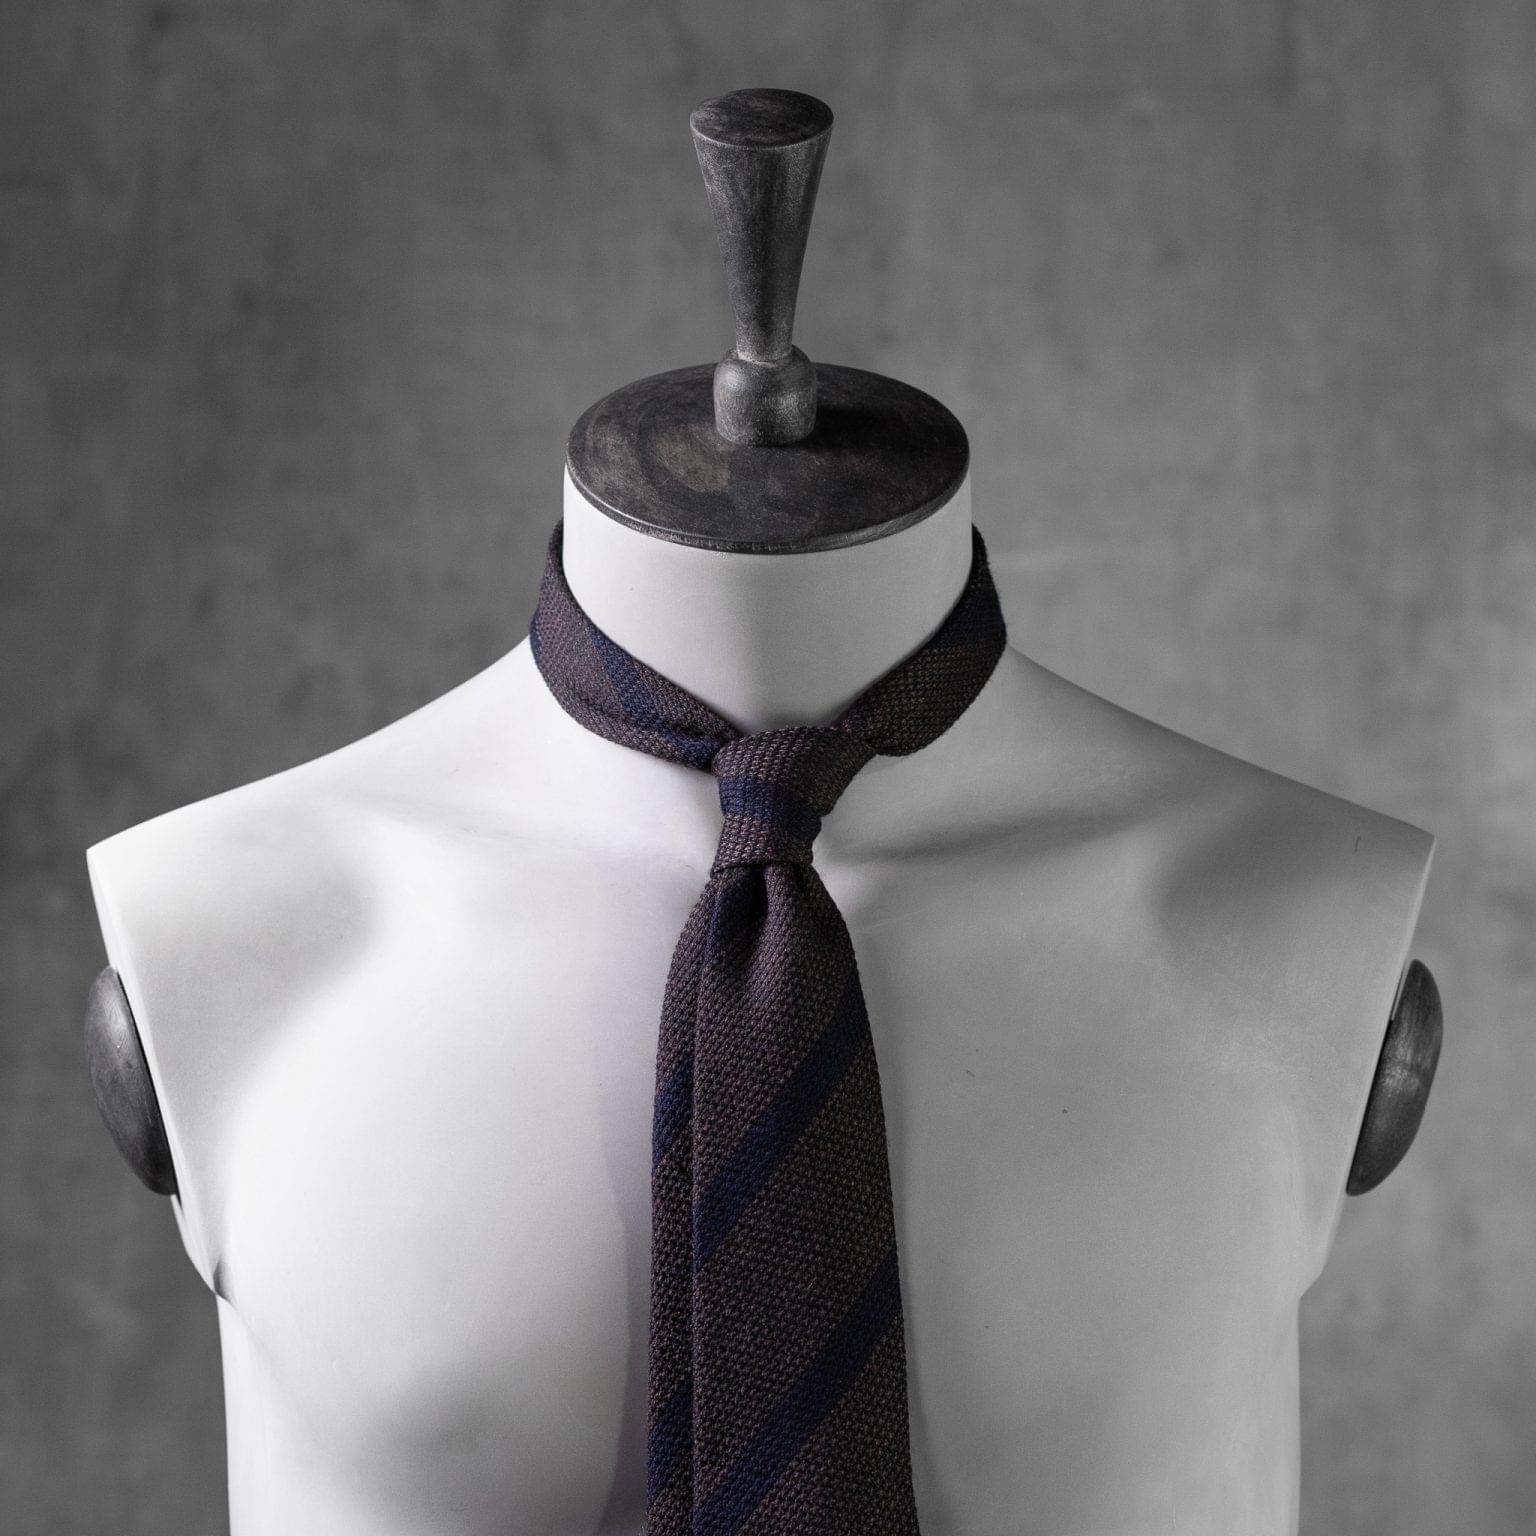 WOOL-LANA-0473-Tie-Initials-Corbata-Iniciales-The-Seelk-3